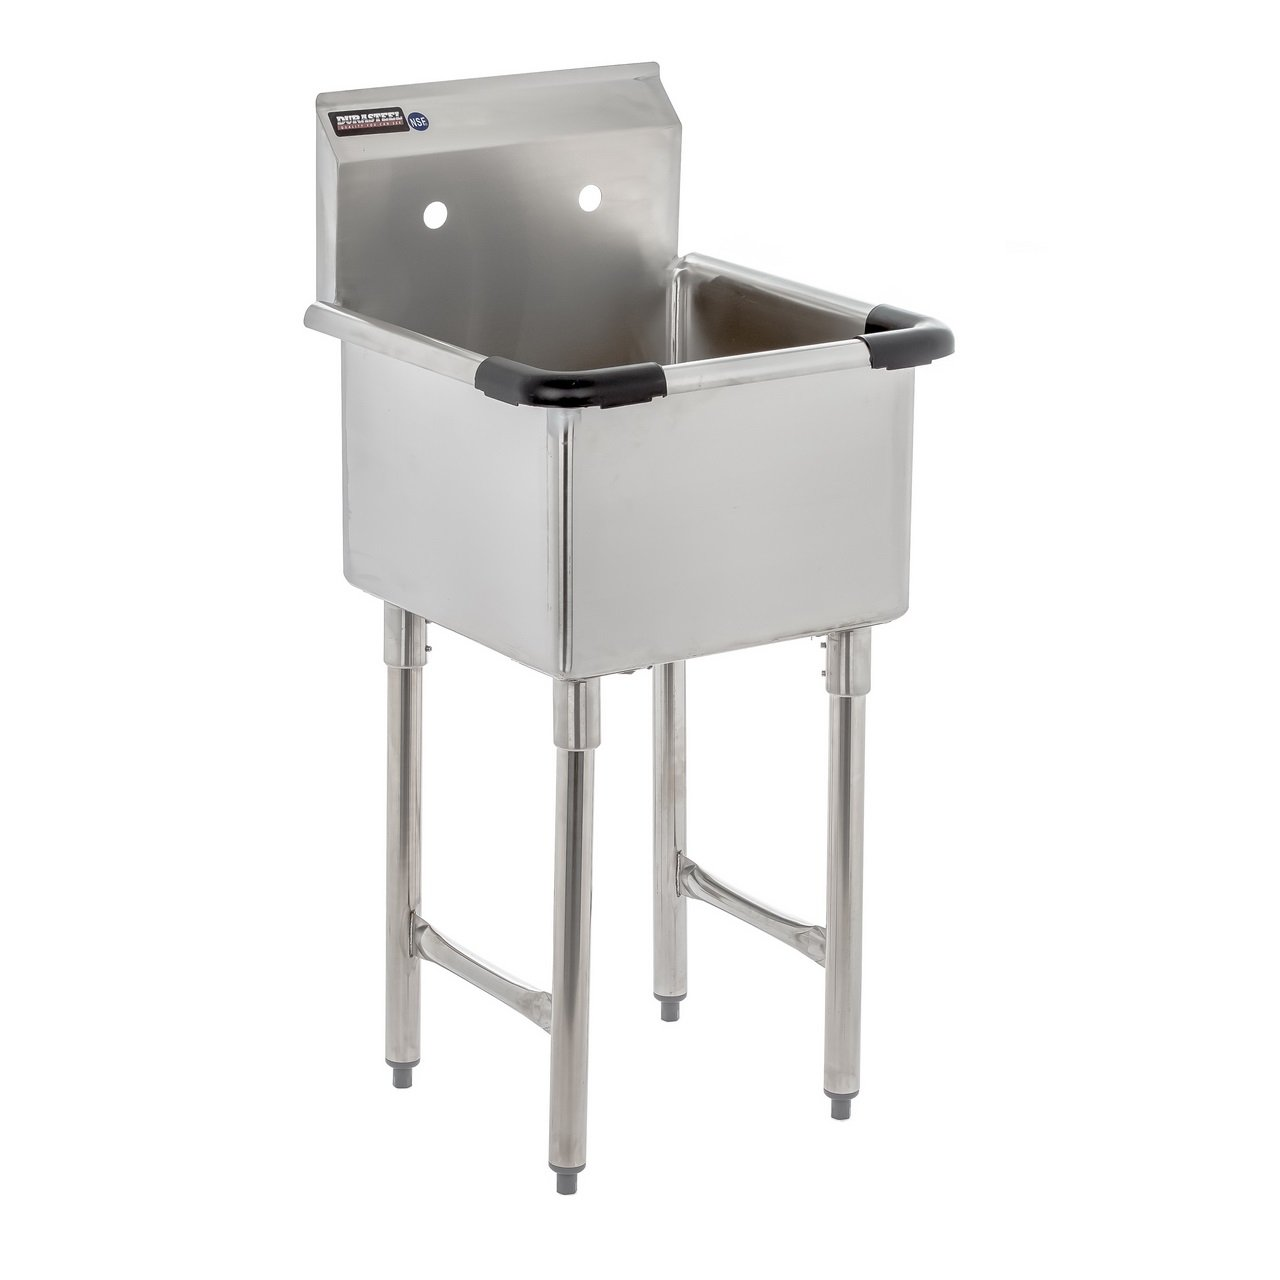 "Apex DuraSteel 1 Compartment Stainless Steel Utility Preparation Prep NSF Sink – 18"" X 18"" Tub Size"